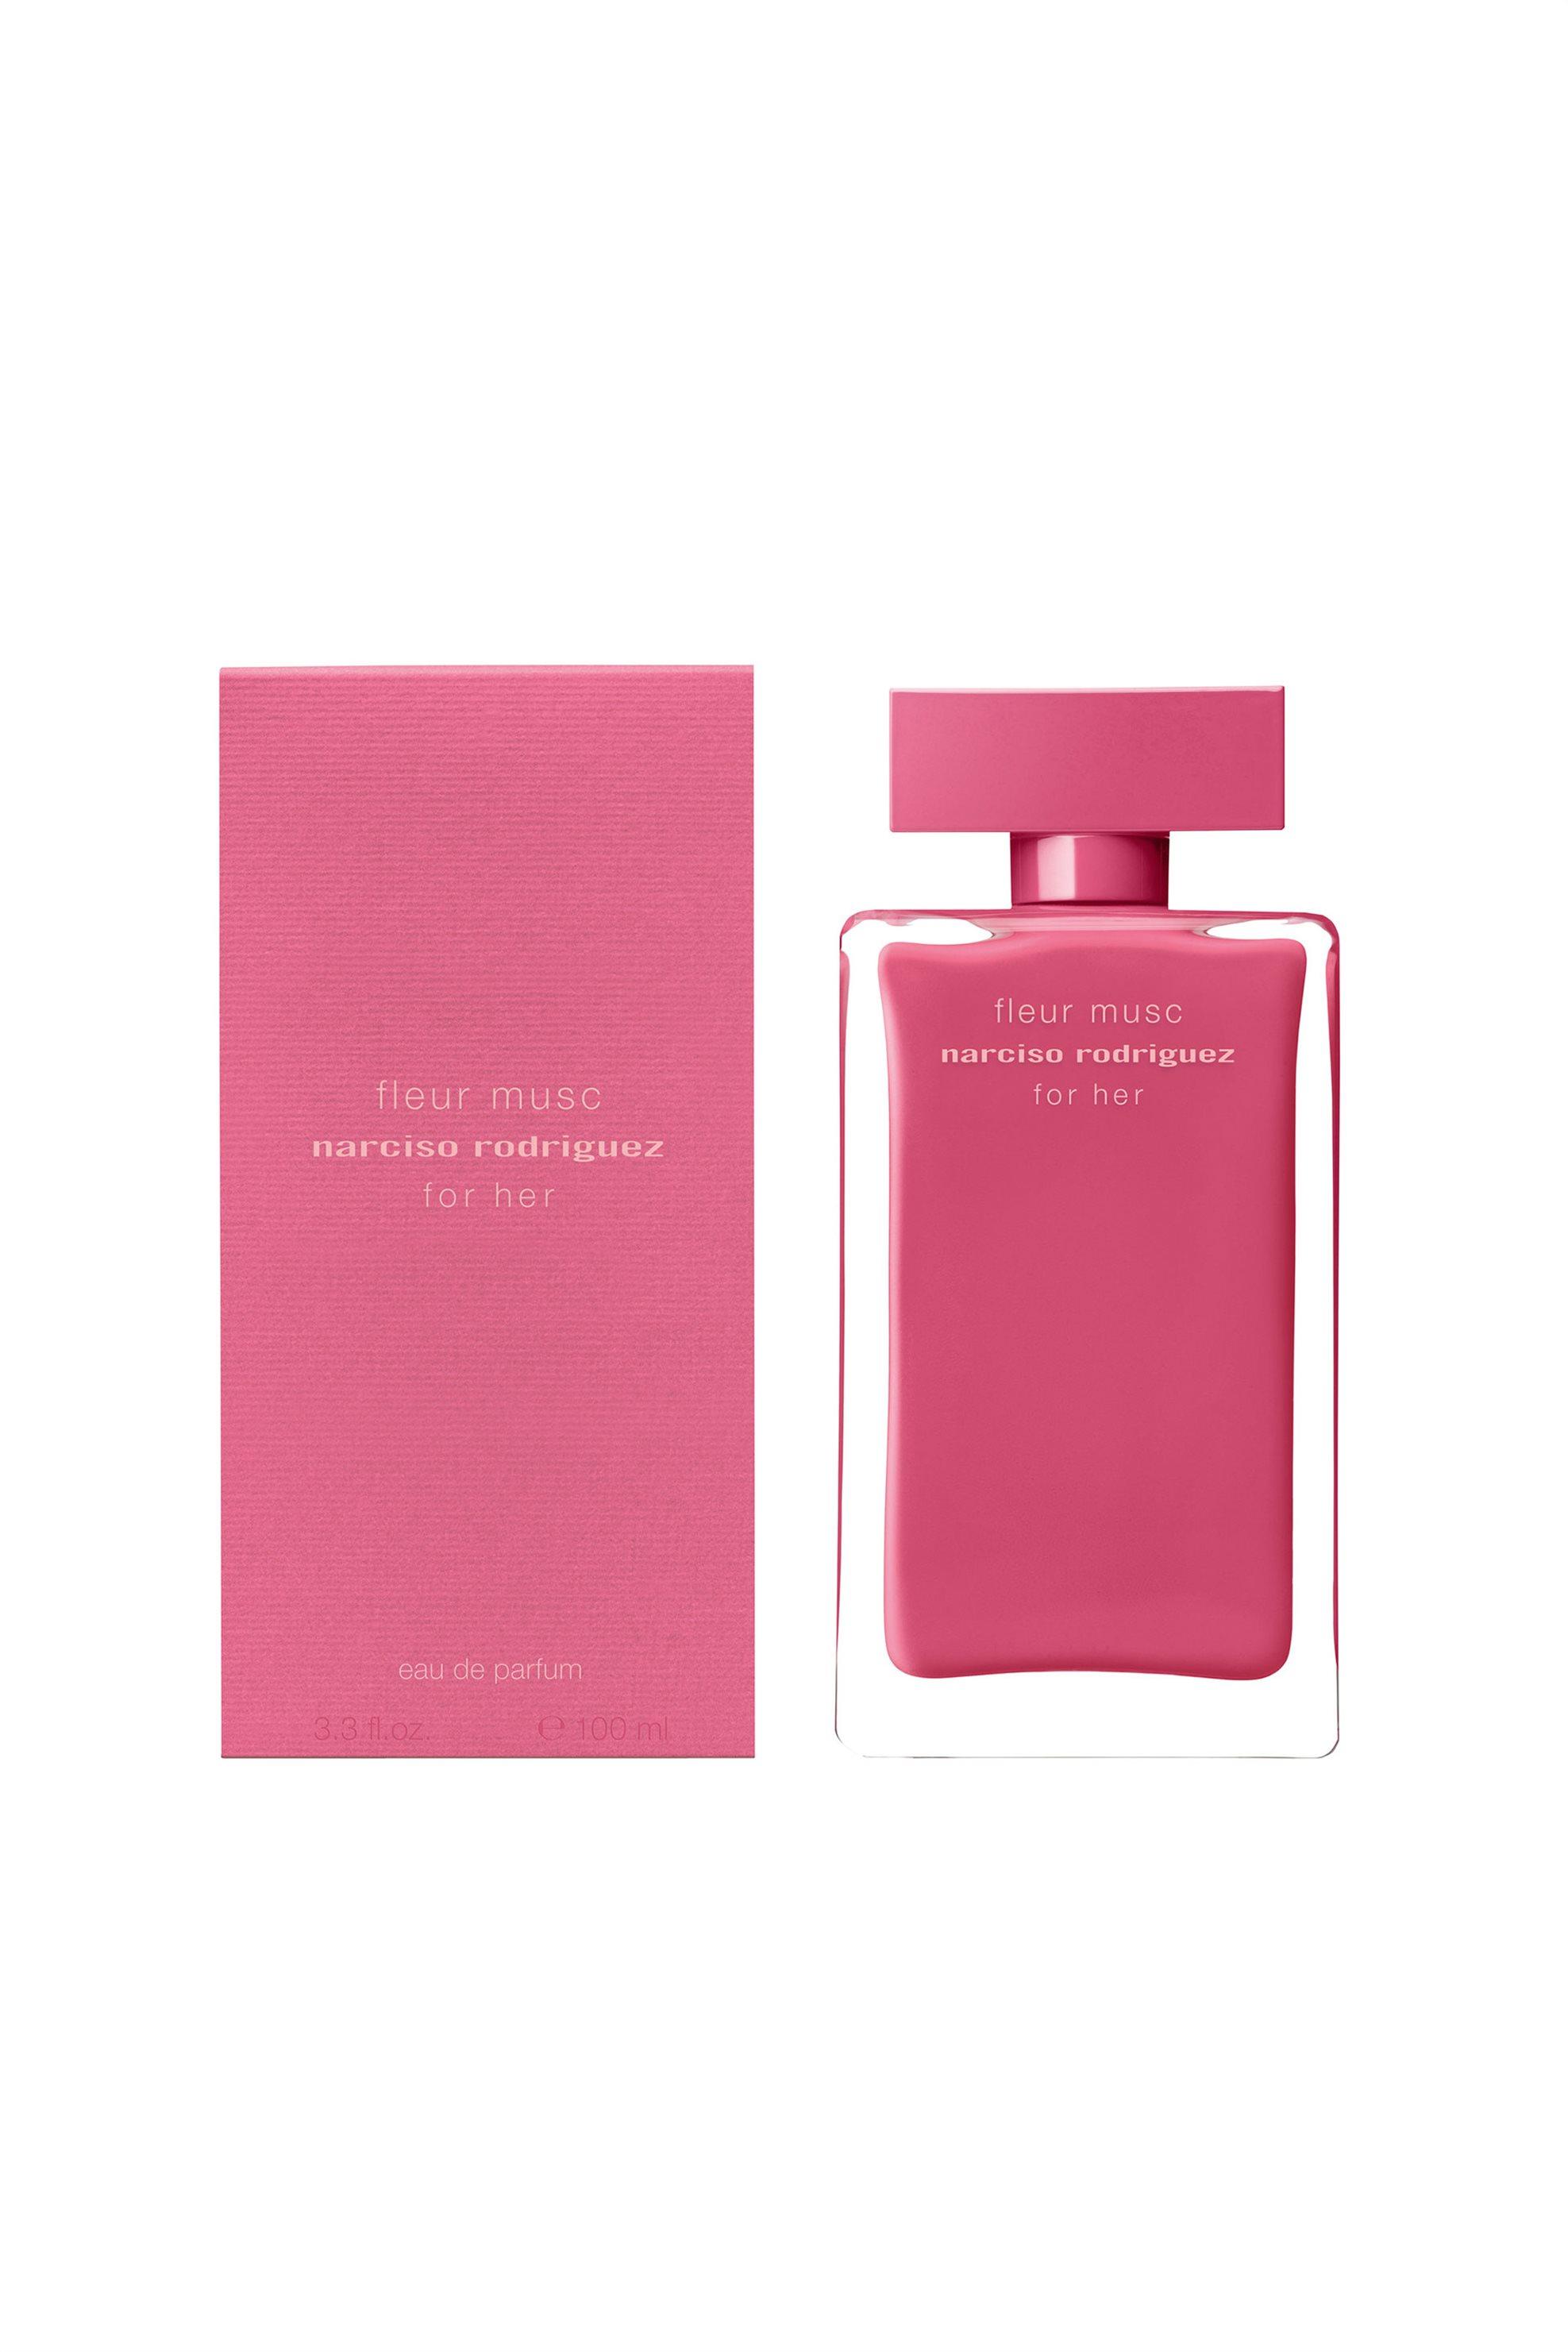 Narciso Rodriguez Narciso Rodriguez For Her Fleur Musc EdP 100 ml - 88187500000 ομορφια   καλλυντικα επιλεκτικησ   αρώματα   γυναικεία αρώματα   eau de parfum